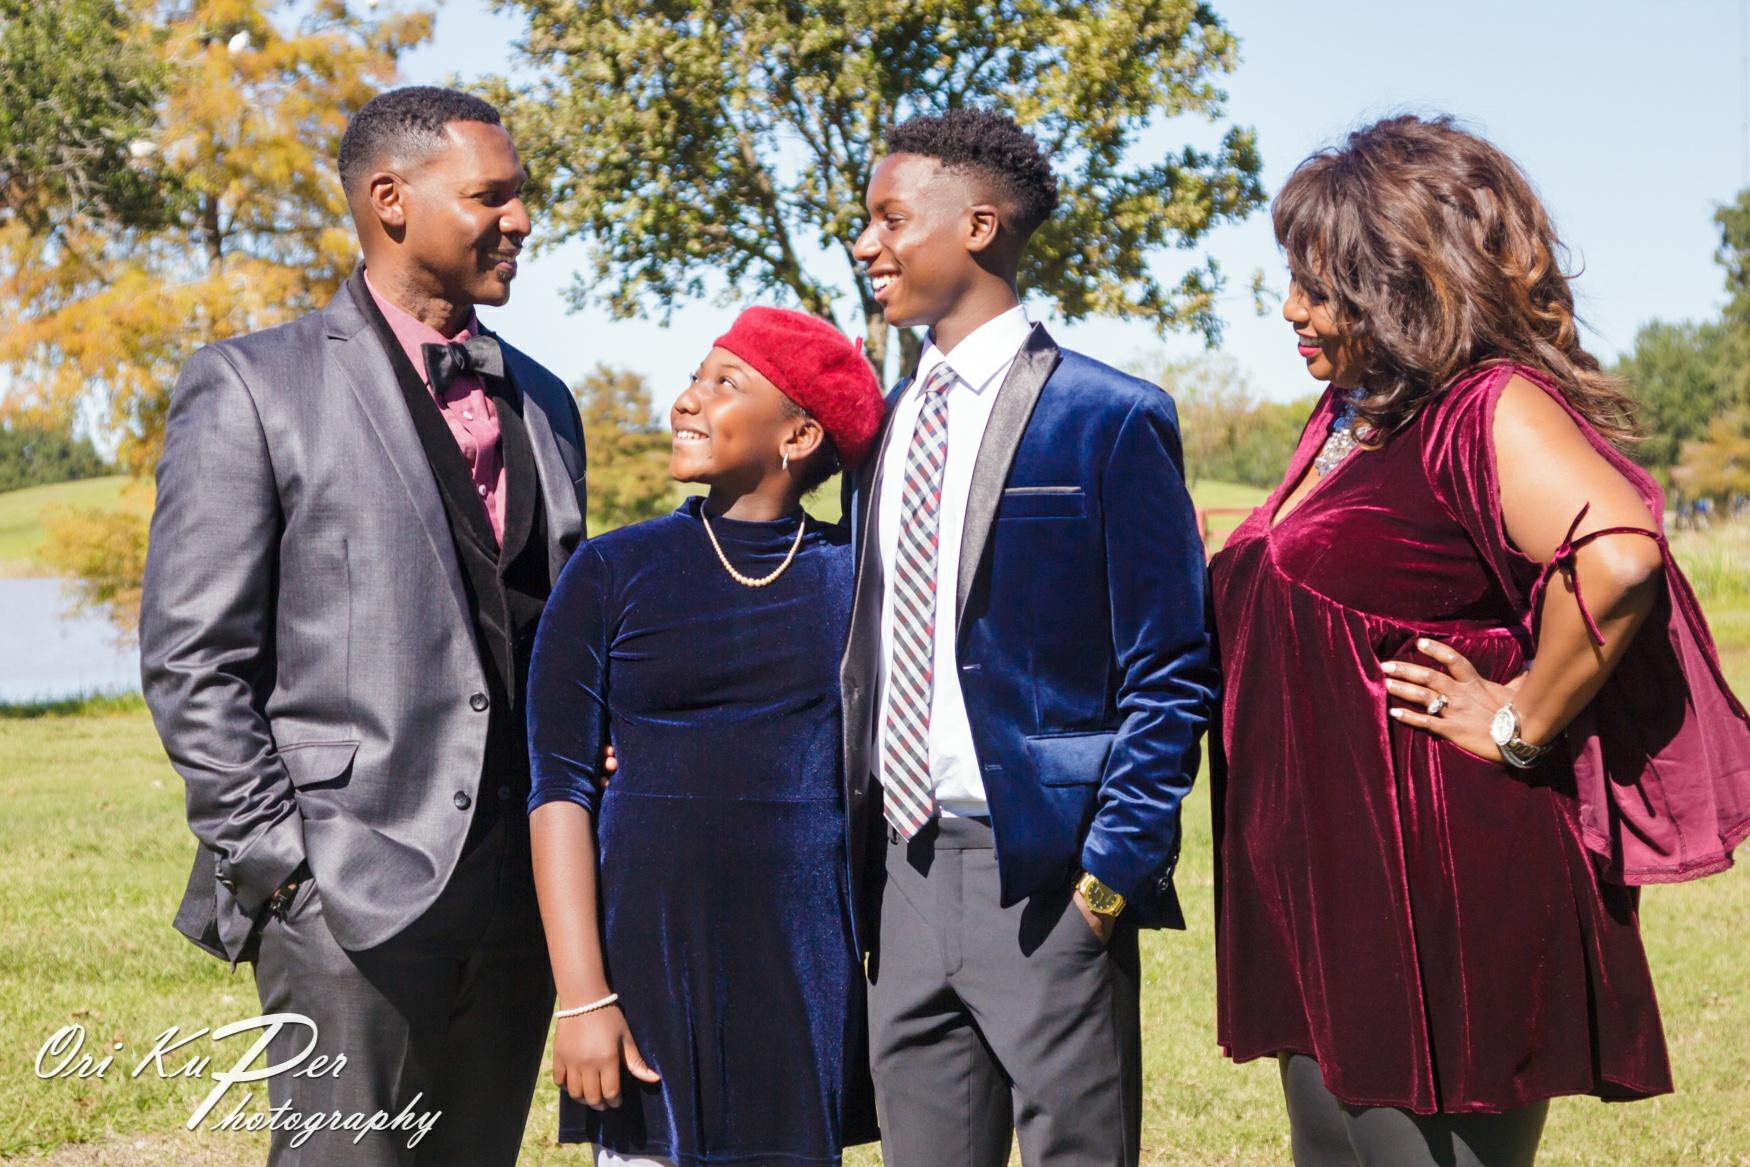 family photos Houston photographer Ori Kuper 003 IMG_5980_www.HOUVideographers.com_